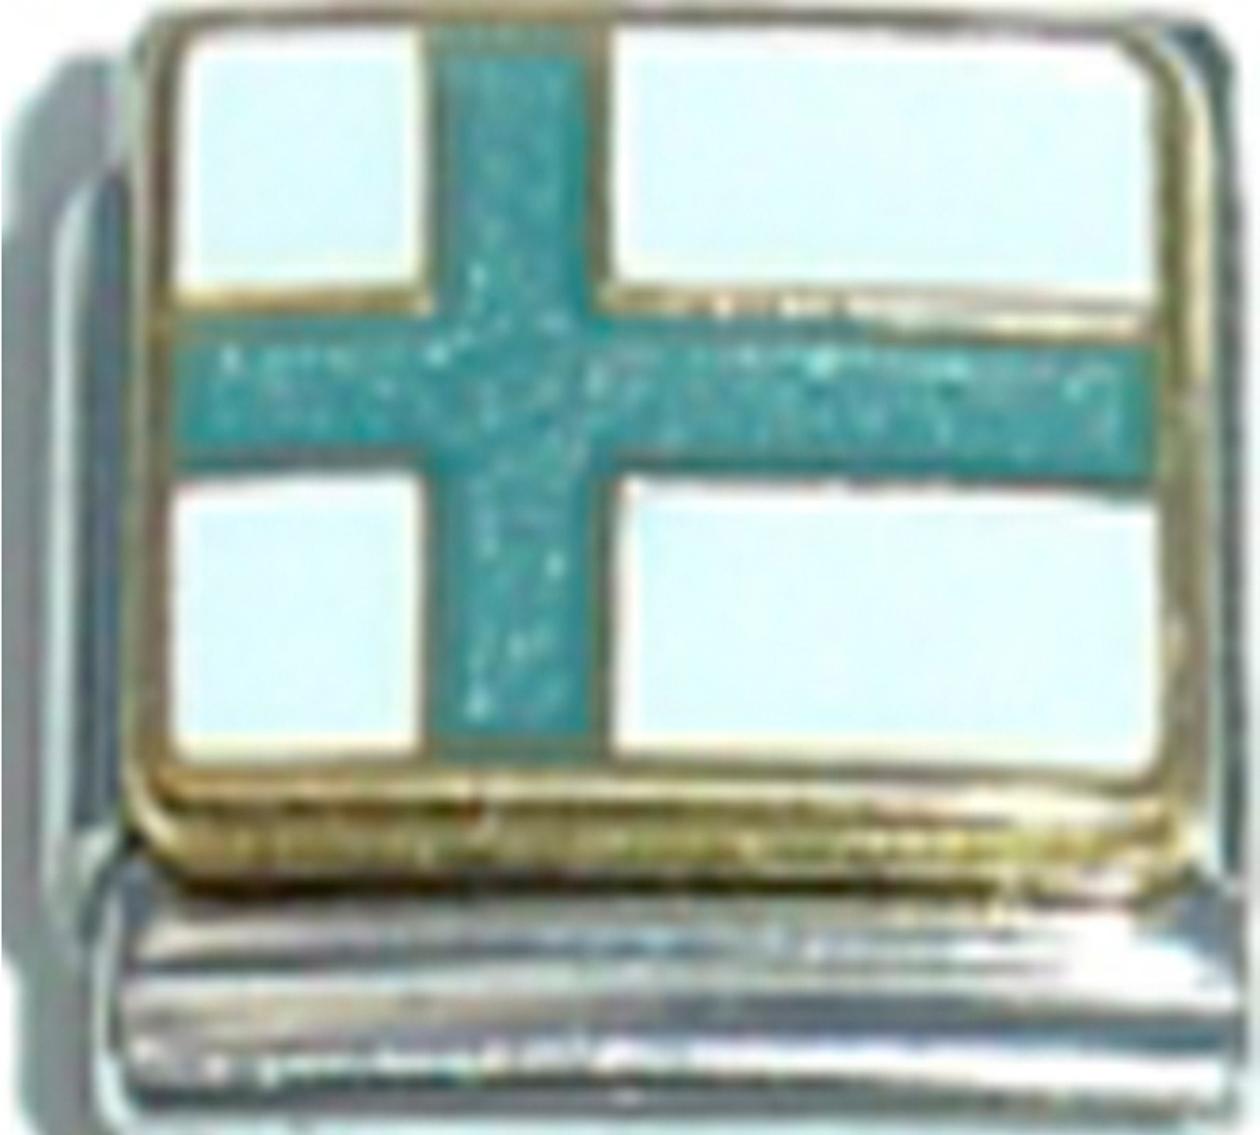 GREECE GREEK FLAG Ceramic Italian Charm 9mm - 1 x PQ019 Single Bracelet Link 2WoGG